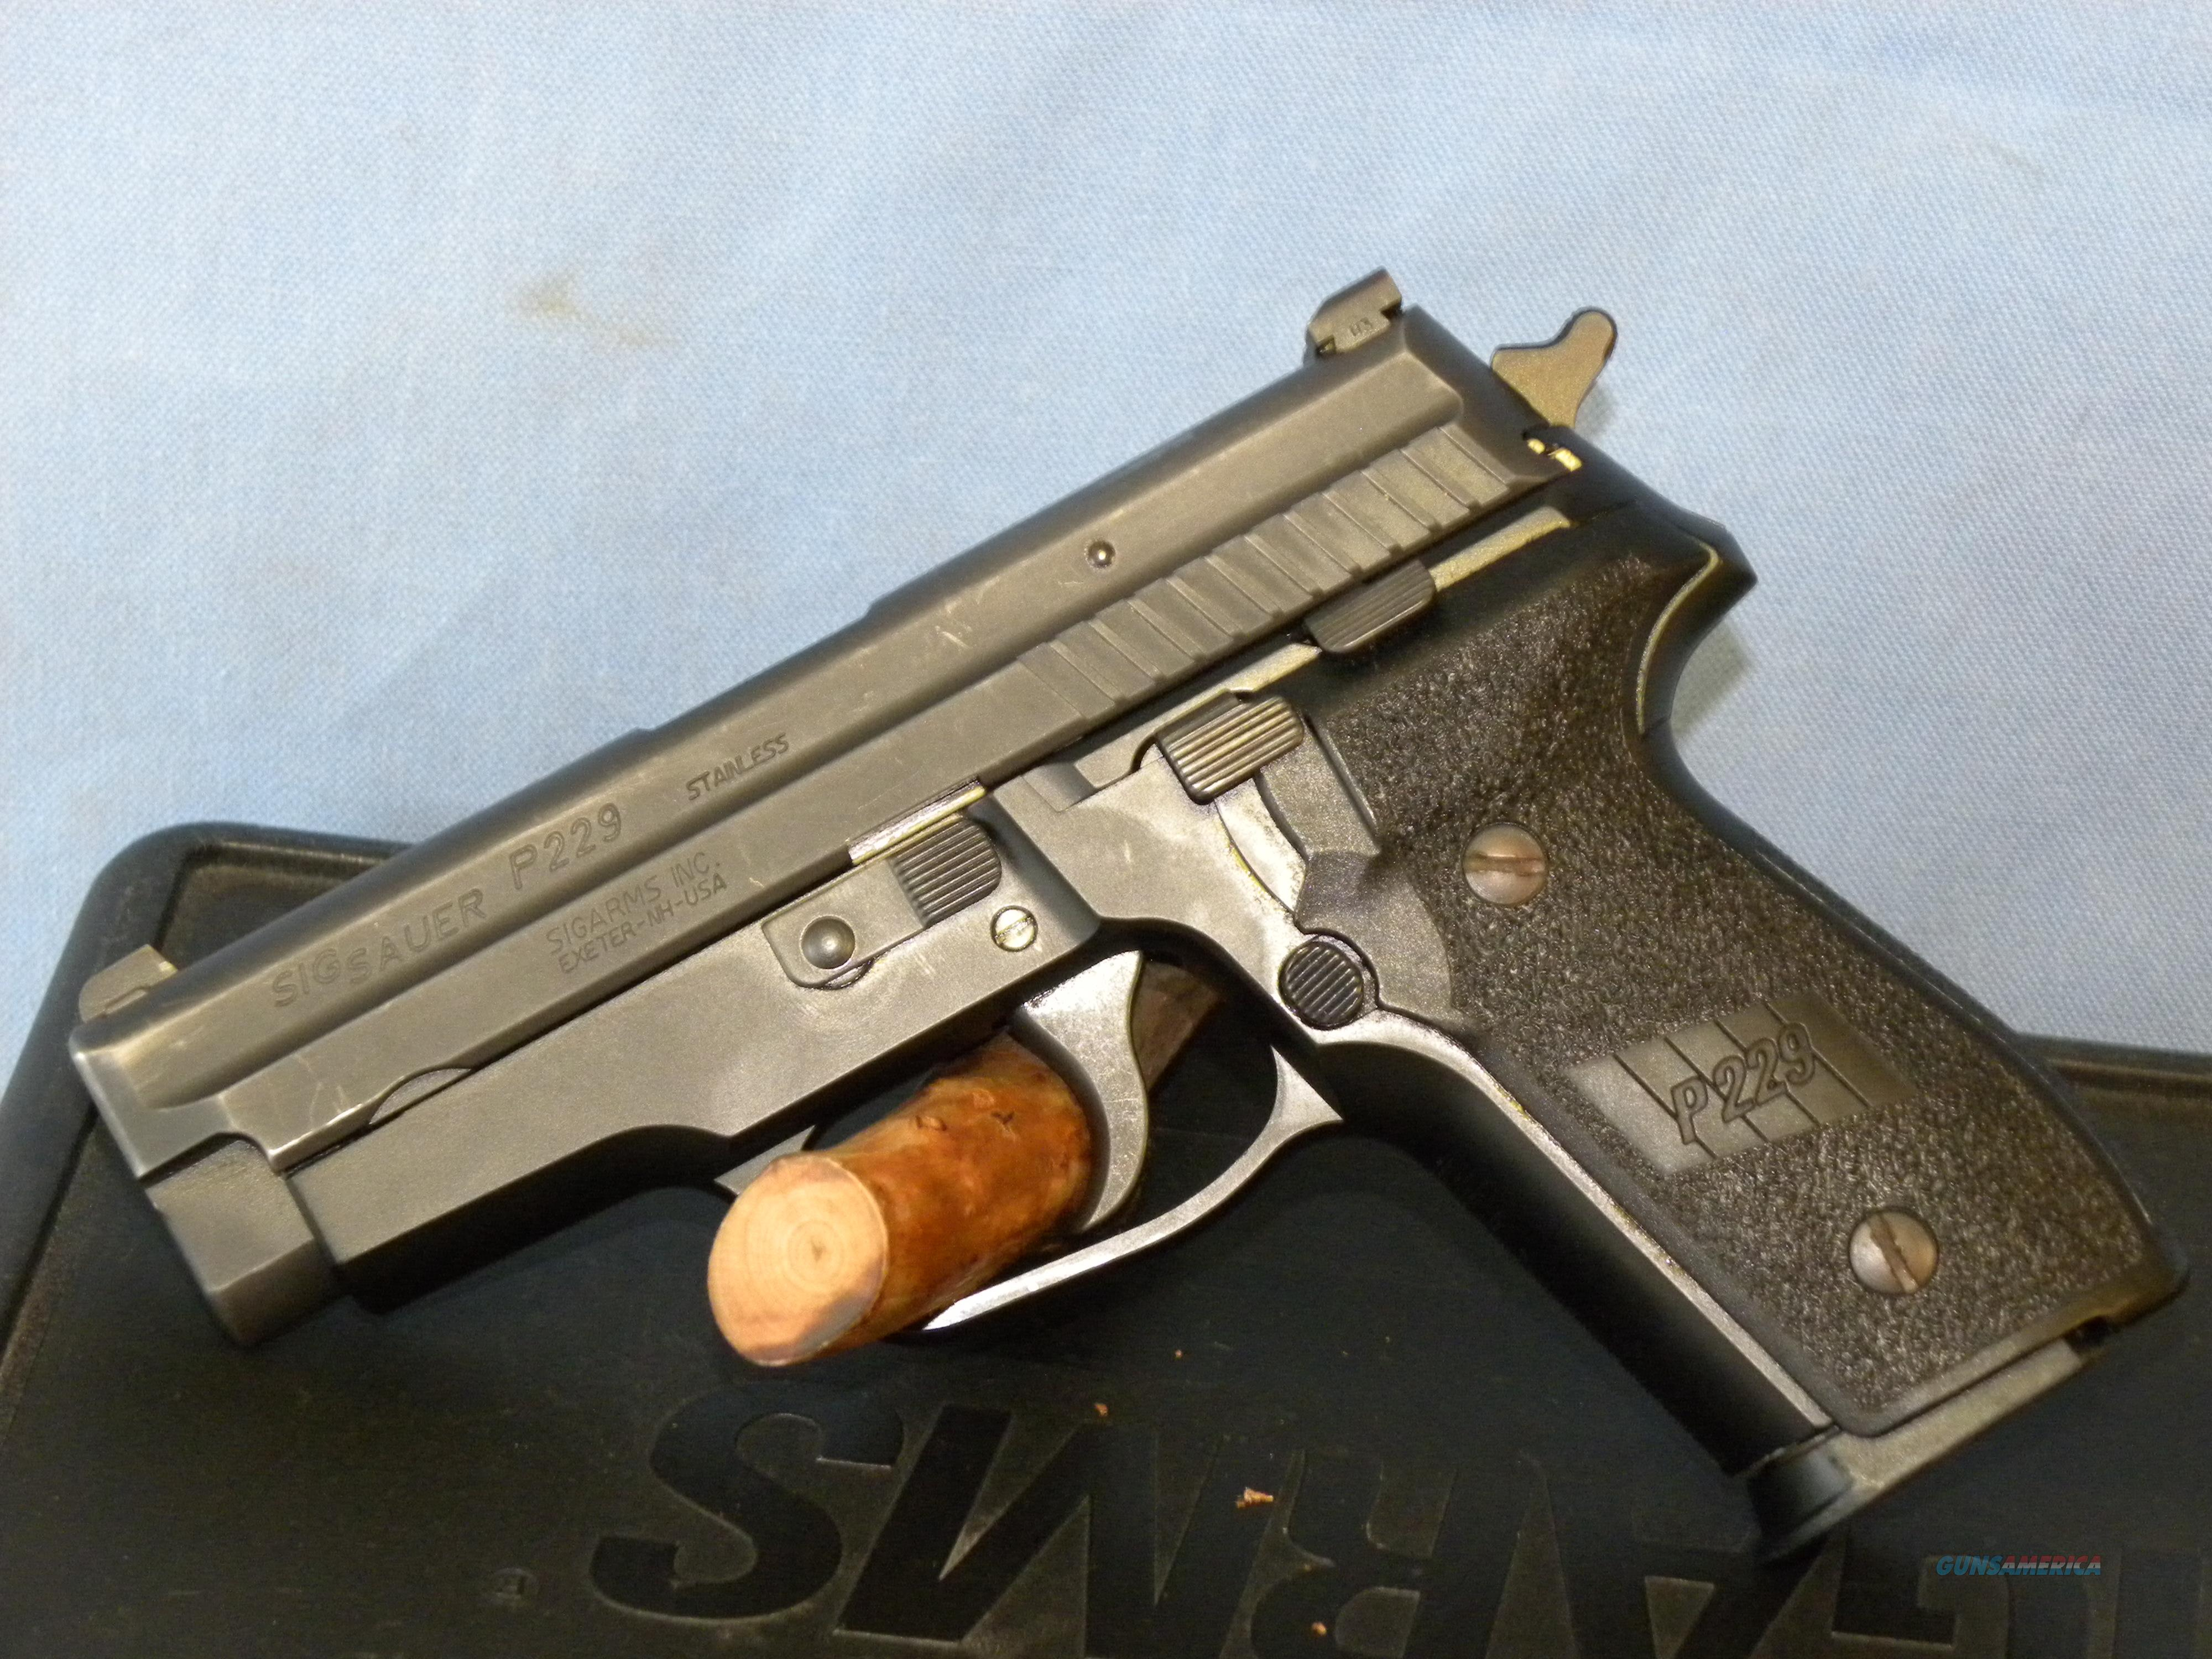 Sig Sauer 229 .40 S&W  Guns > Pistols > Sig - Sauer/Sigarms Pistols > P229